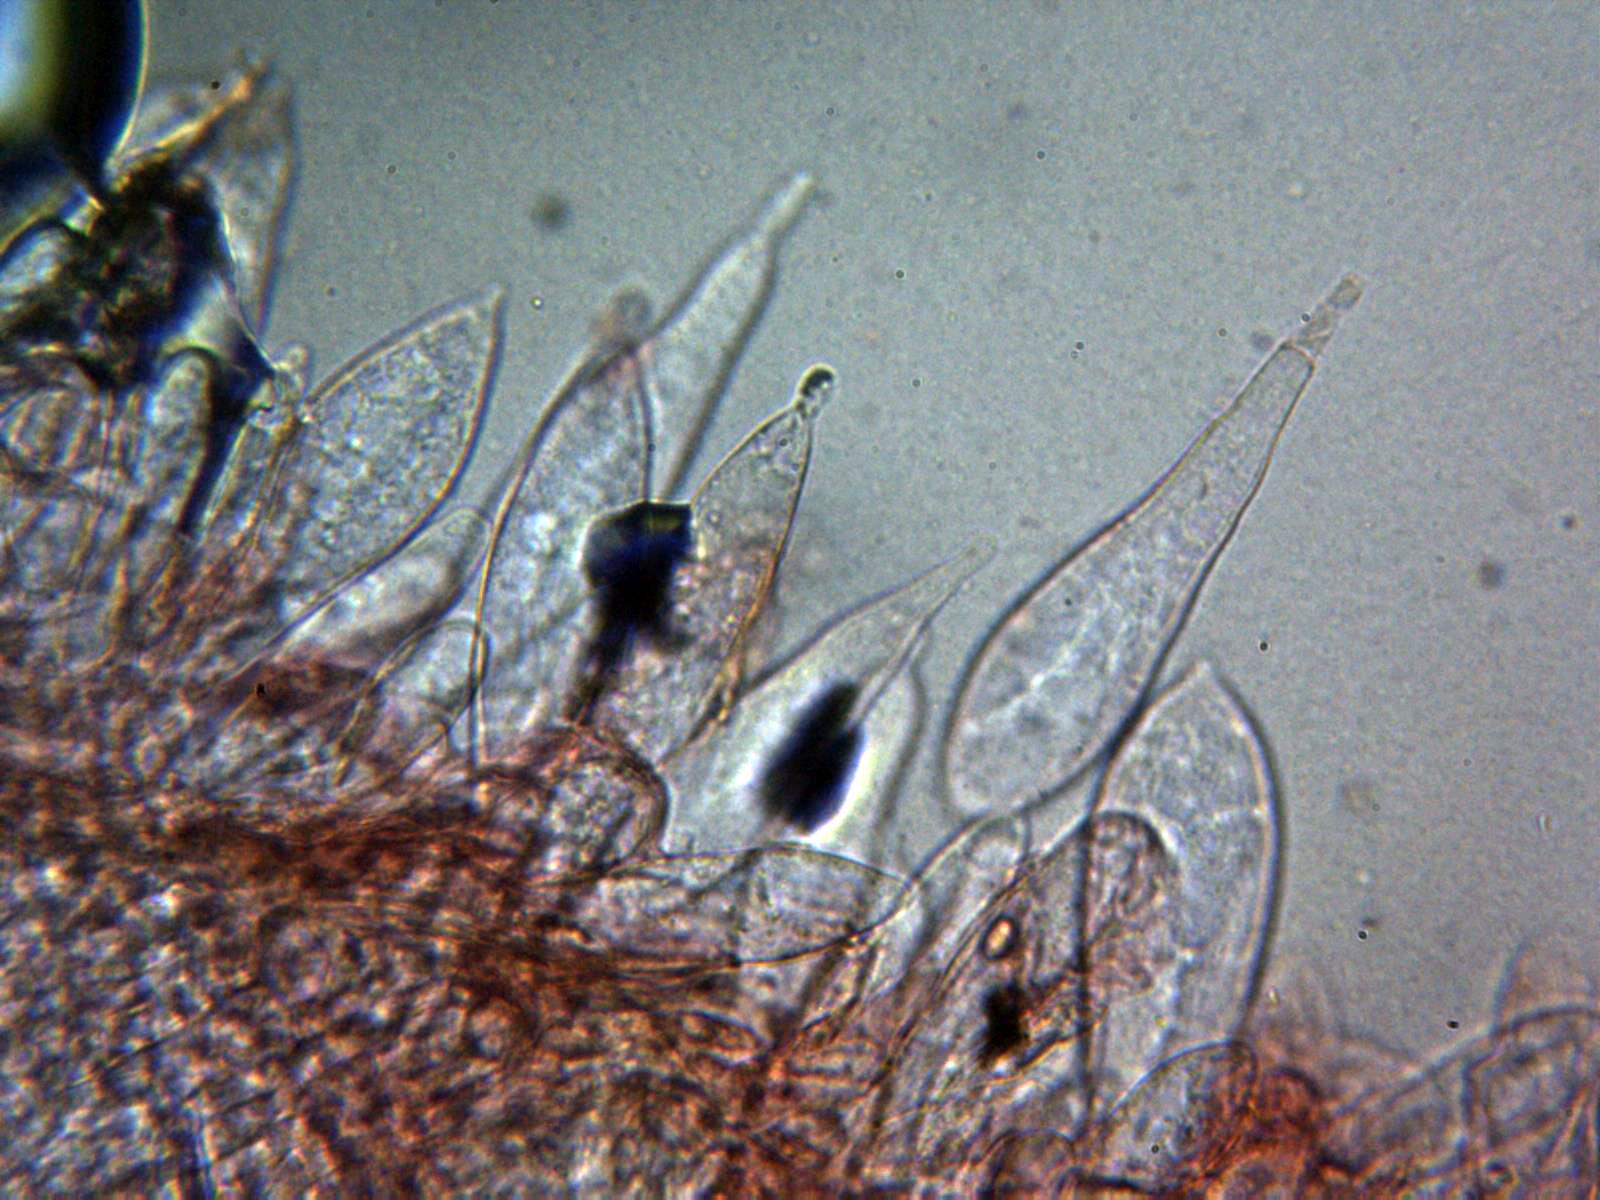 Queilocistidiosx400_2020-11-23.jpg